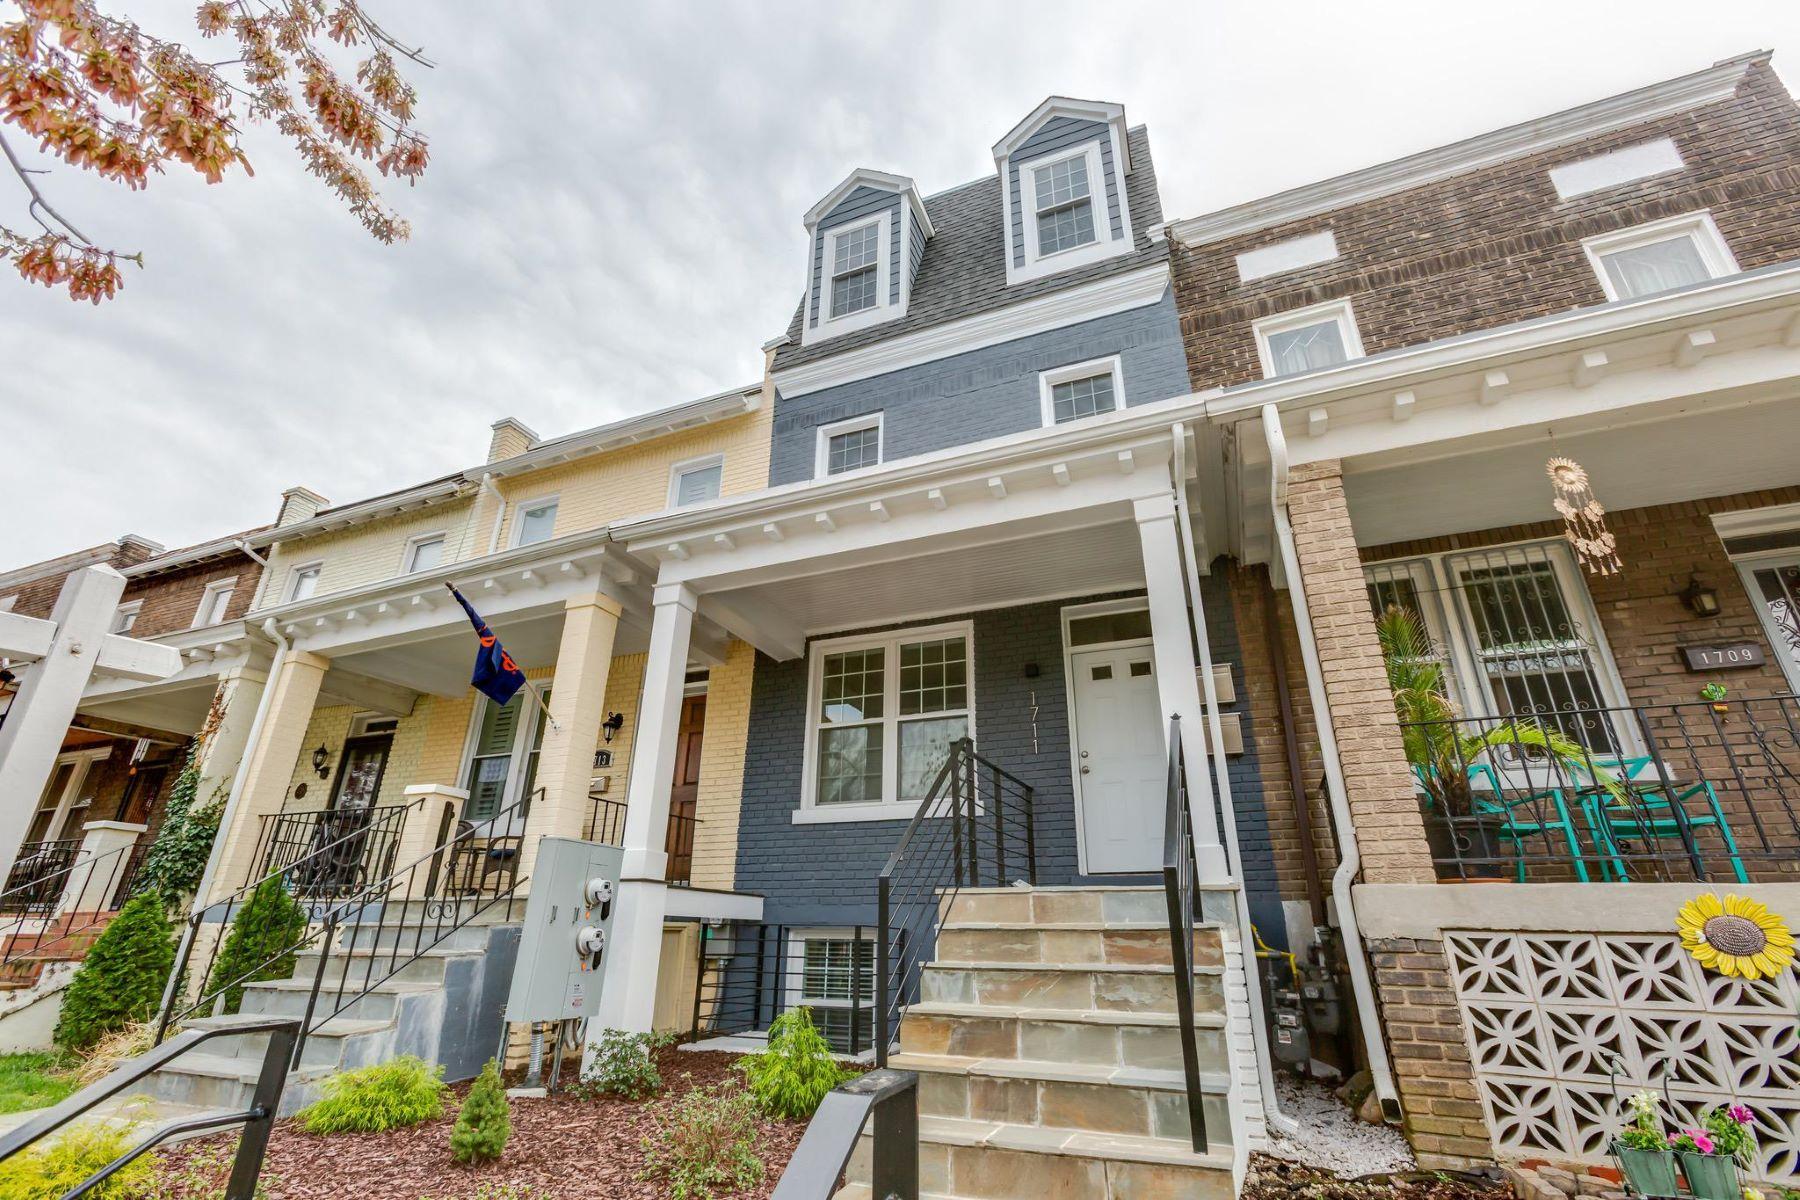 Condominium for Sale at 1711 D St SE #2 1711 D St SE #2 Washington, District Of Columbia 20003 United States